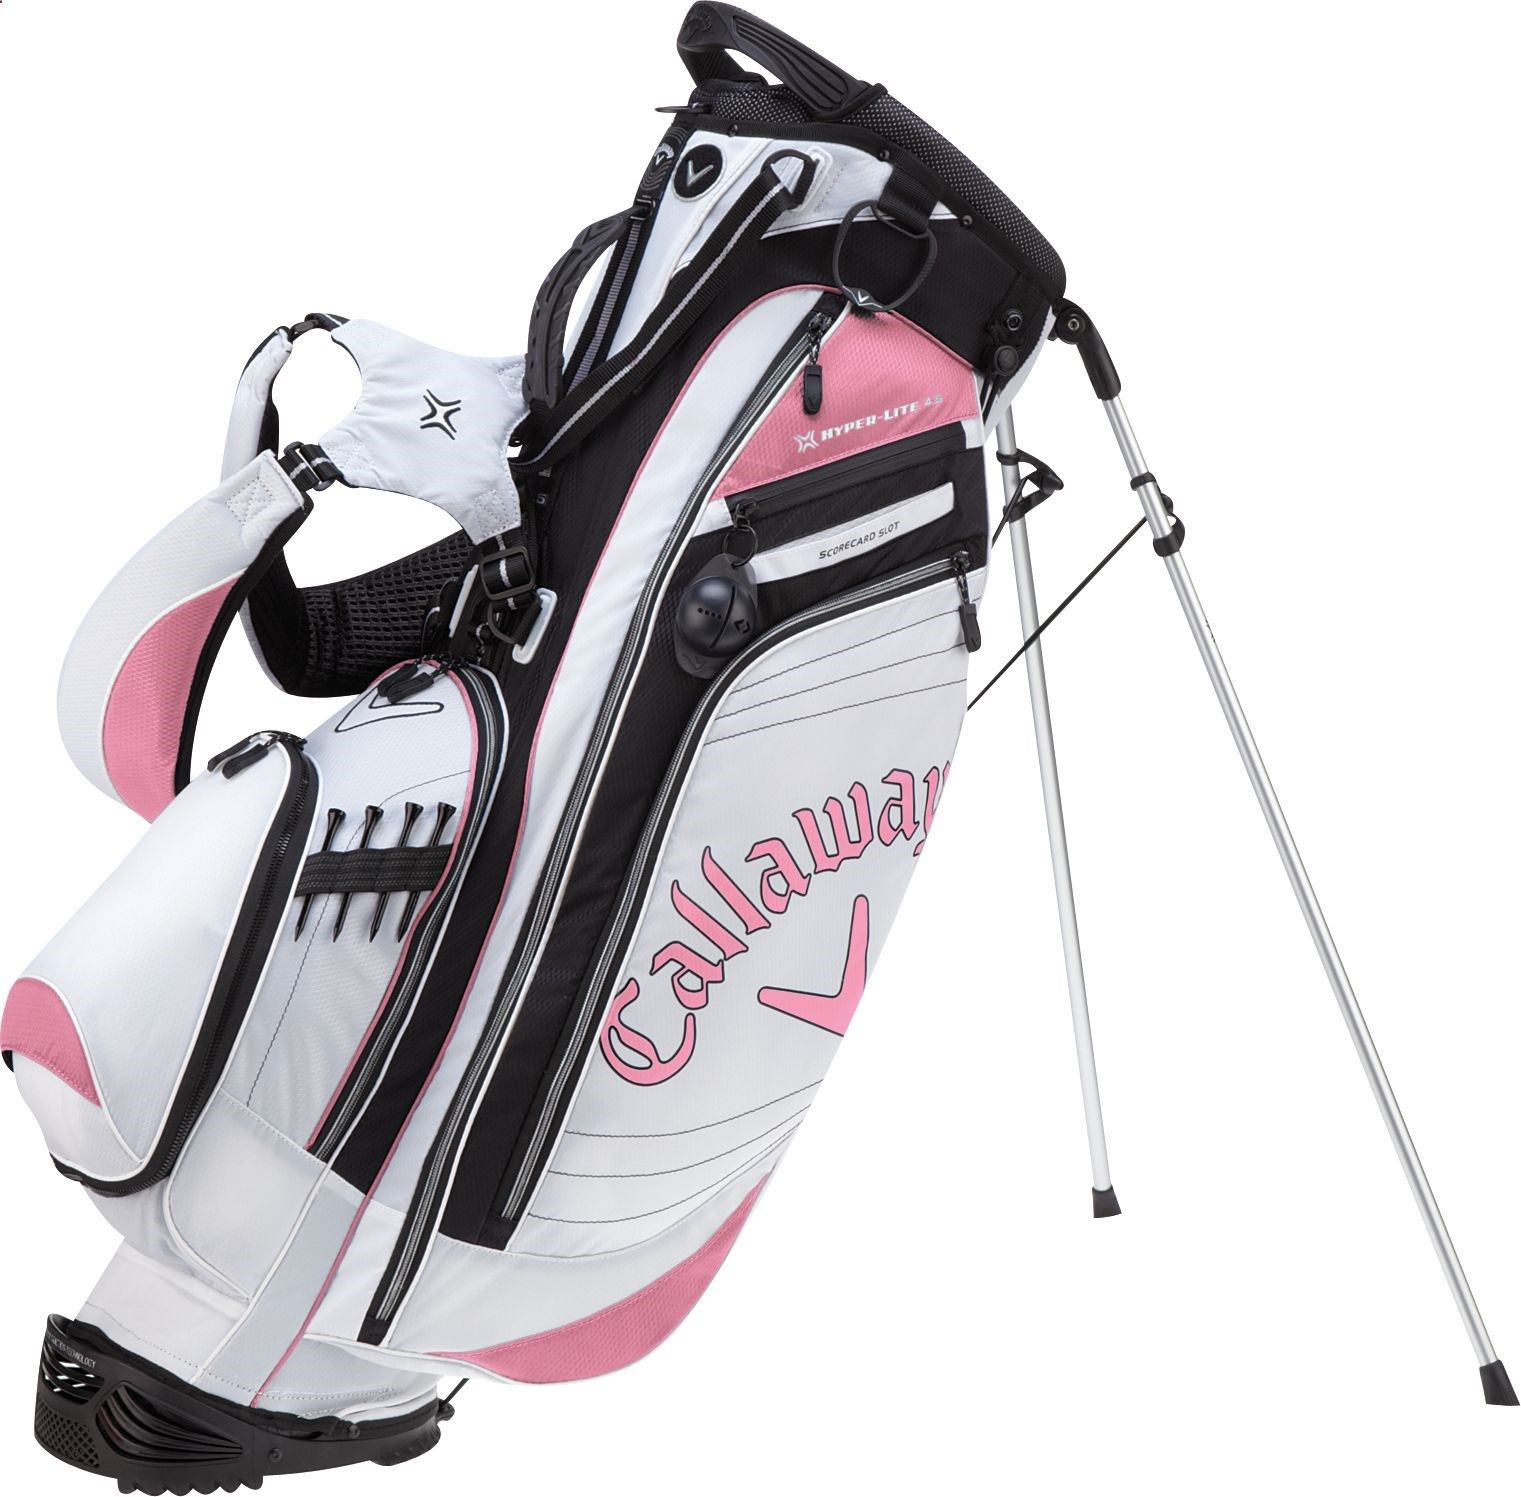 Callaway Womens Hyper Lite 4 5 Stand Bag Golf Bags Unlimited